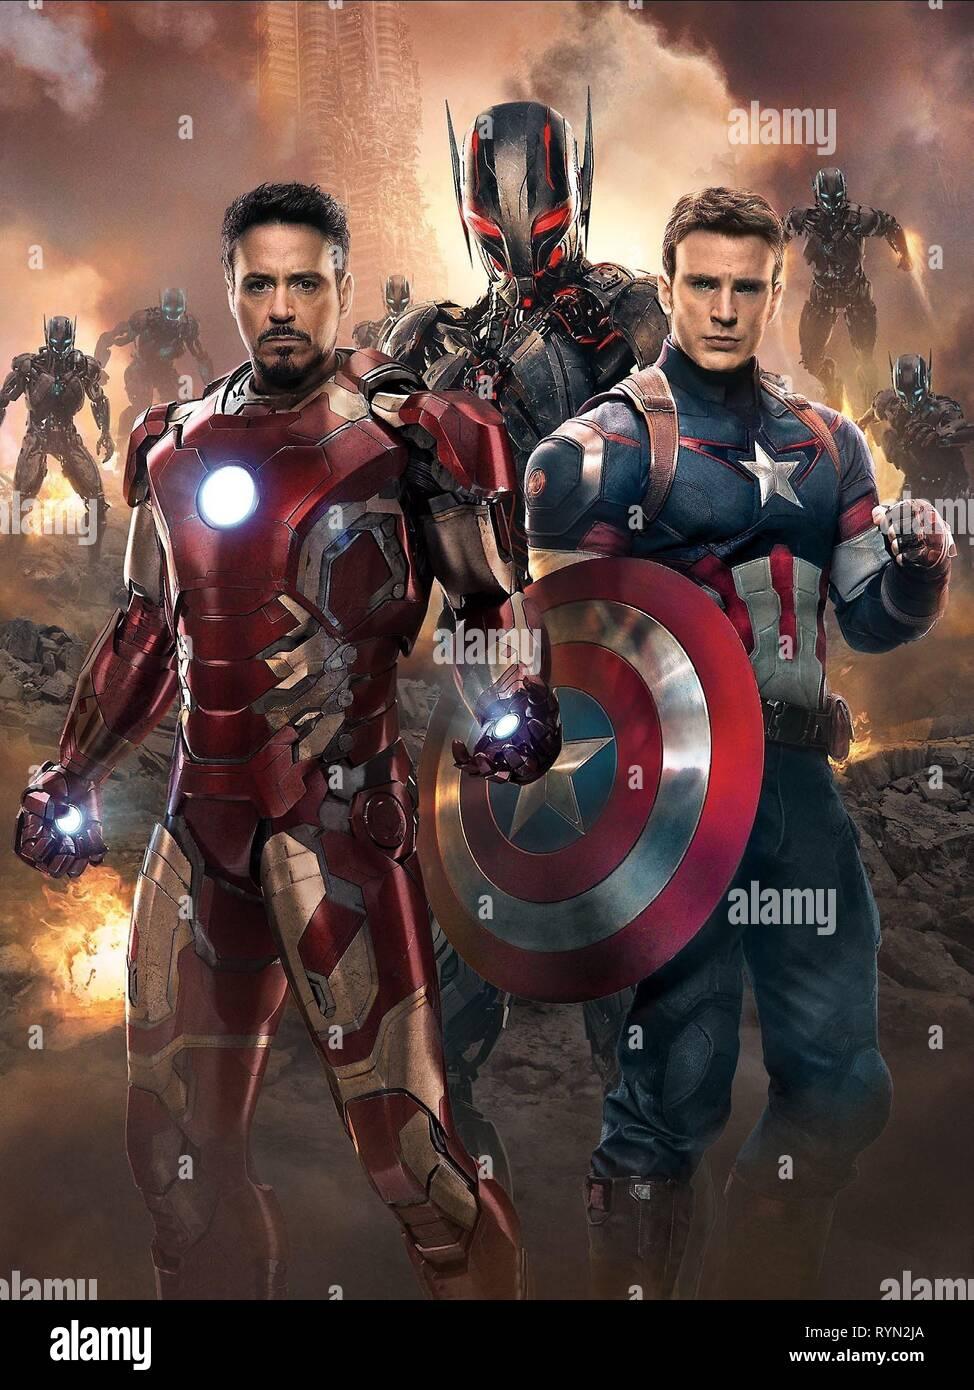 Jr Evans Avengers Age Of Ultron 2015 Stock Photo Alamy